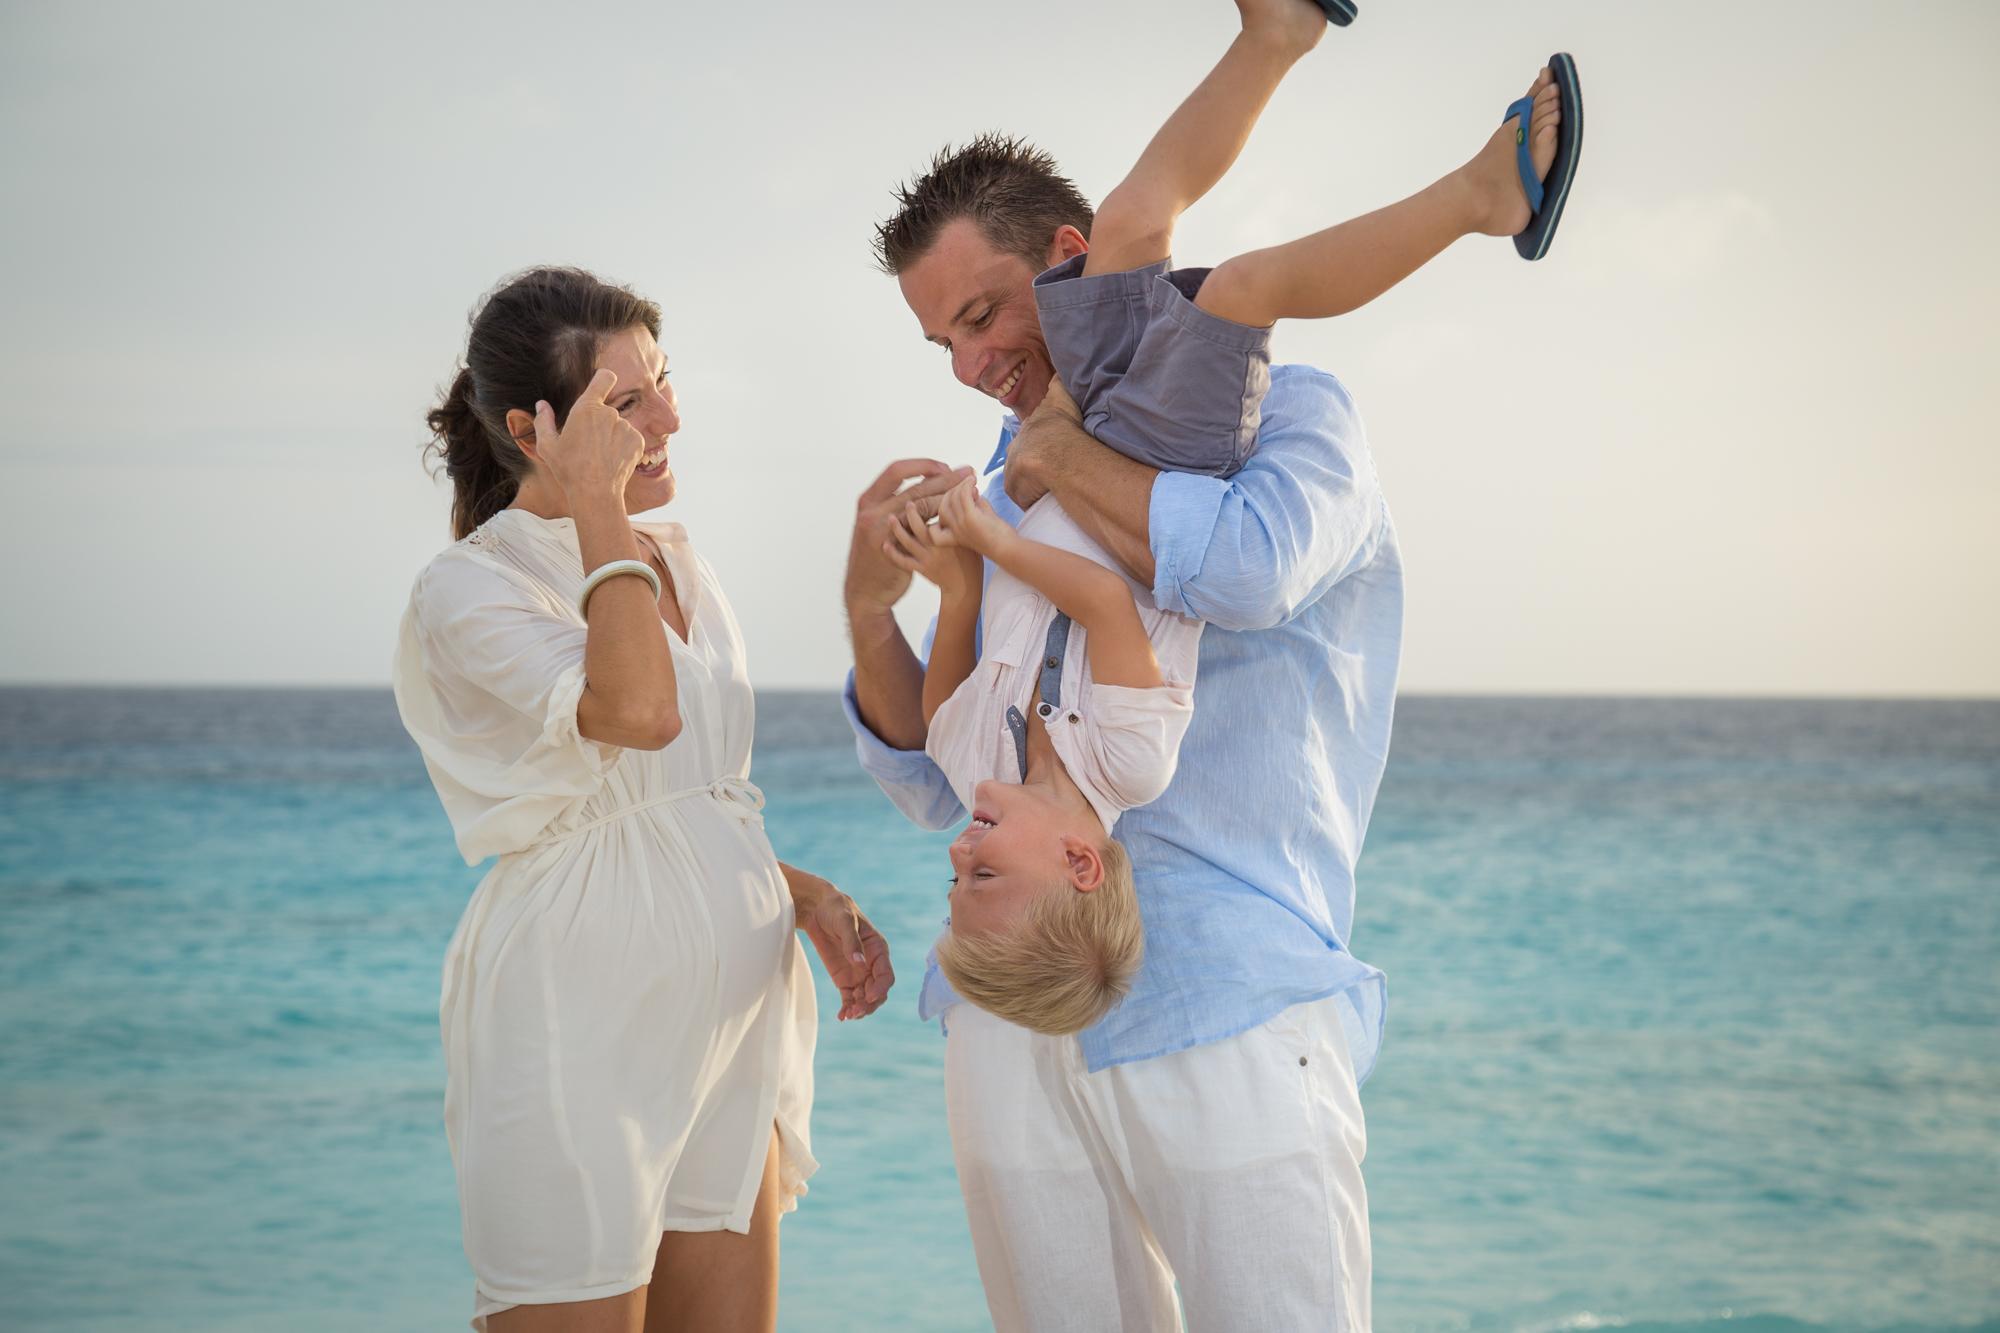 BEACH MATERNITY PHOTOS | Caribbean Sunset Maternity Session